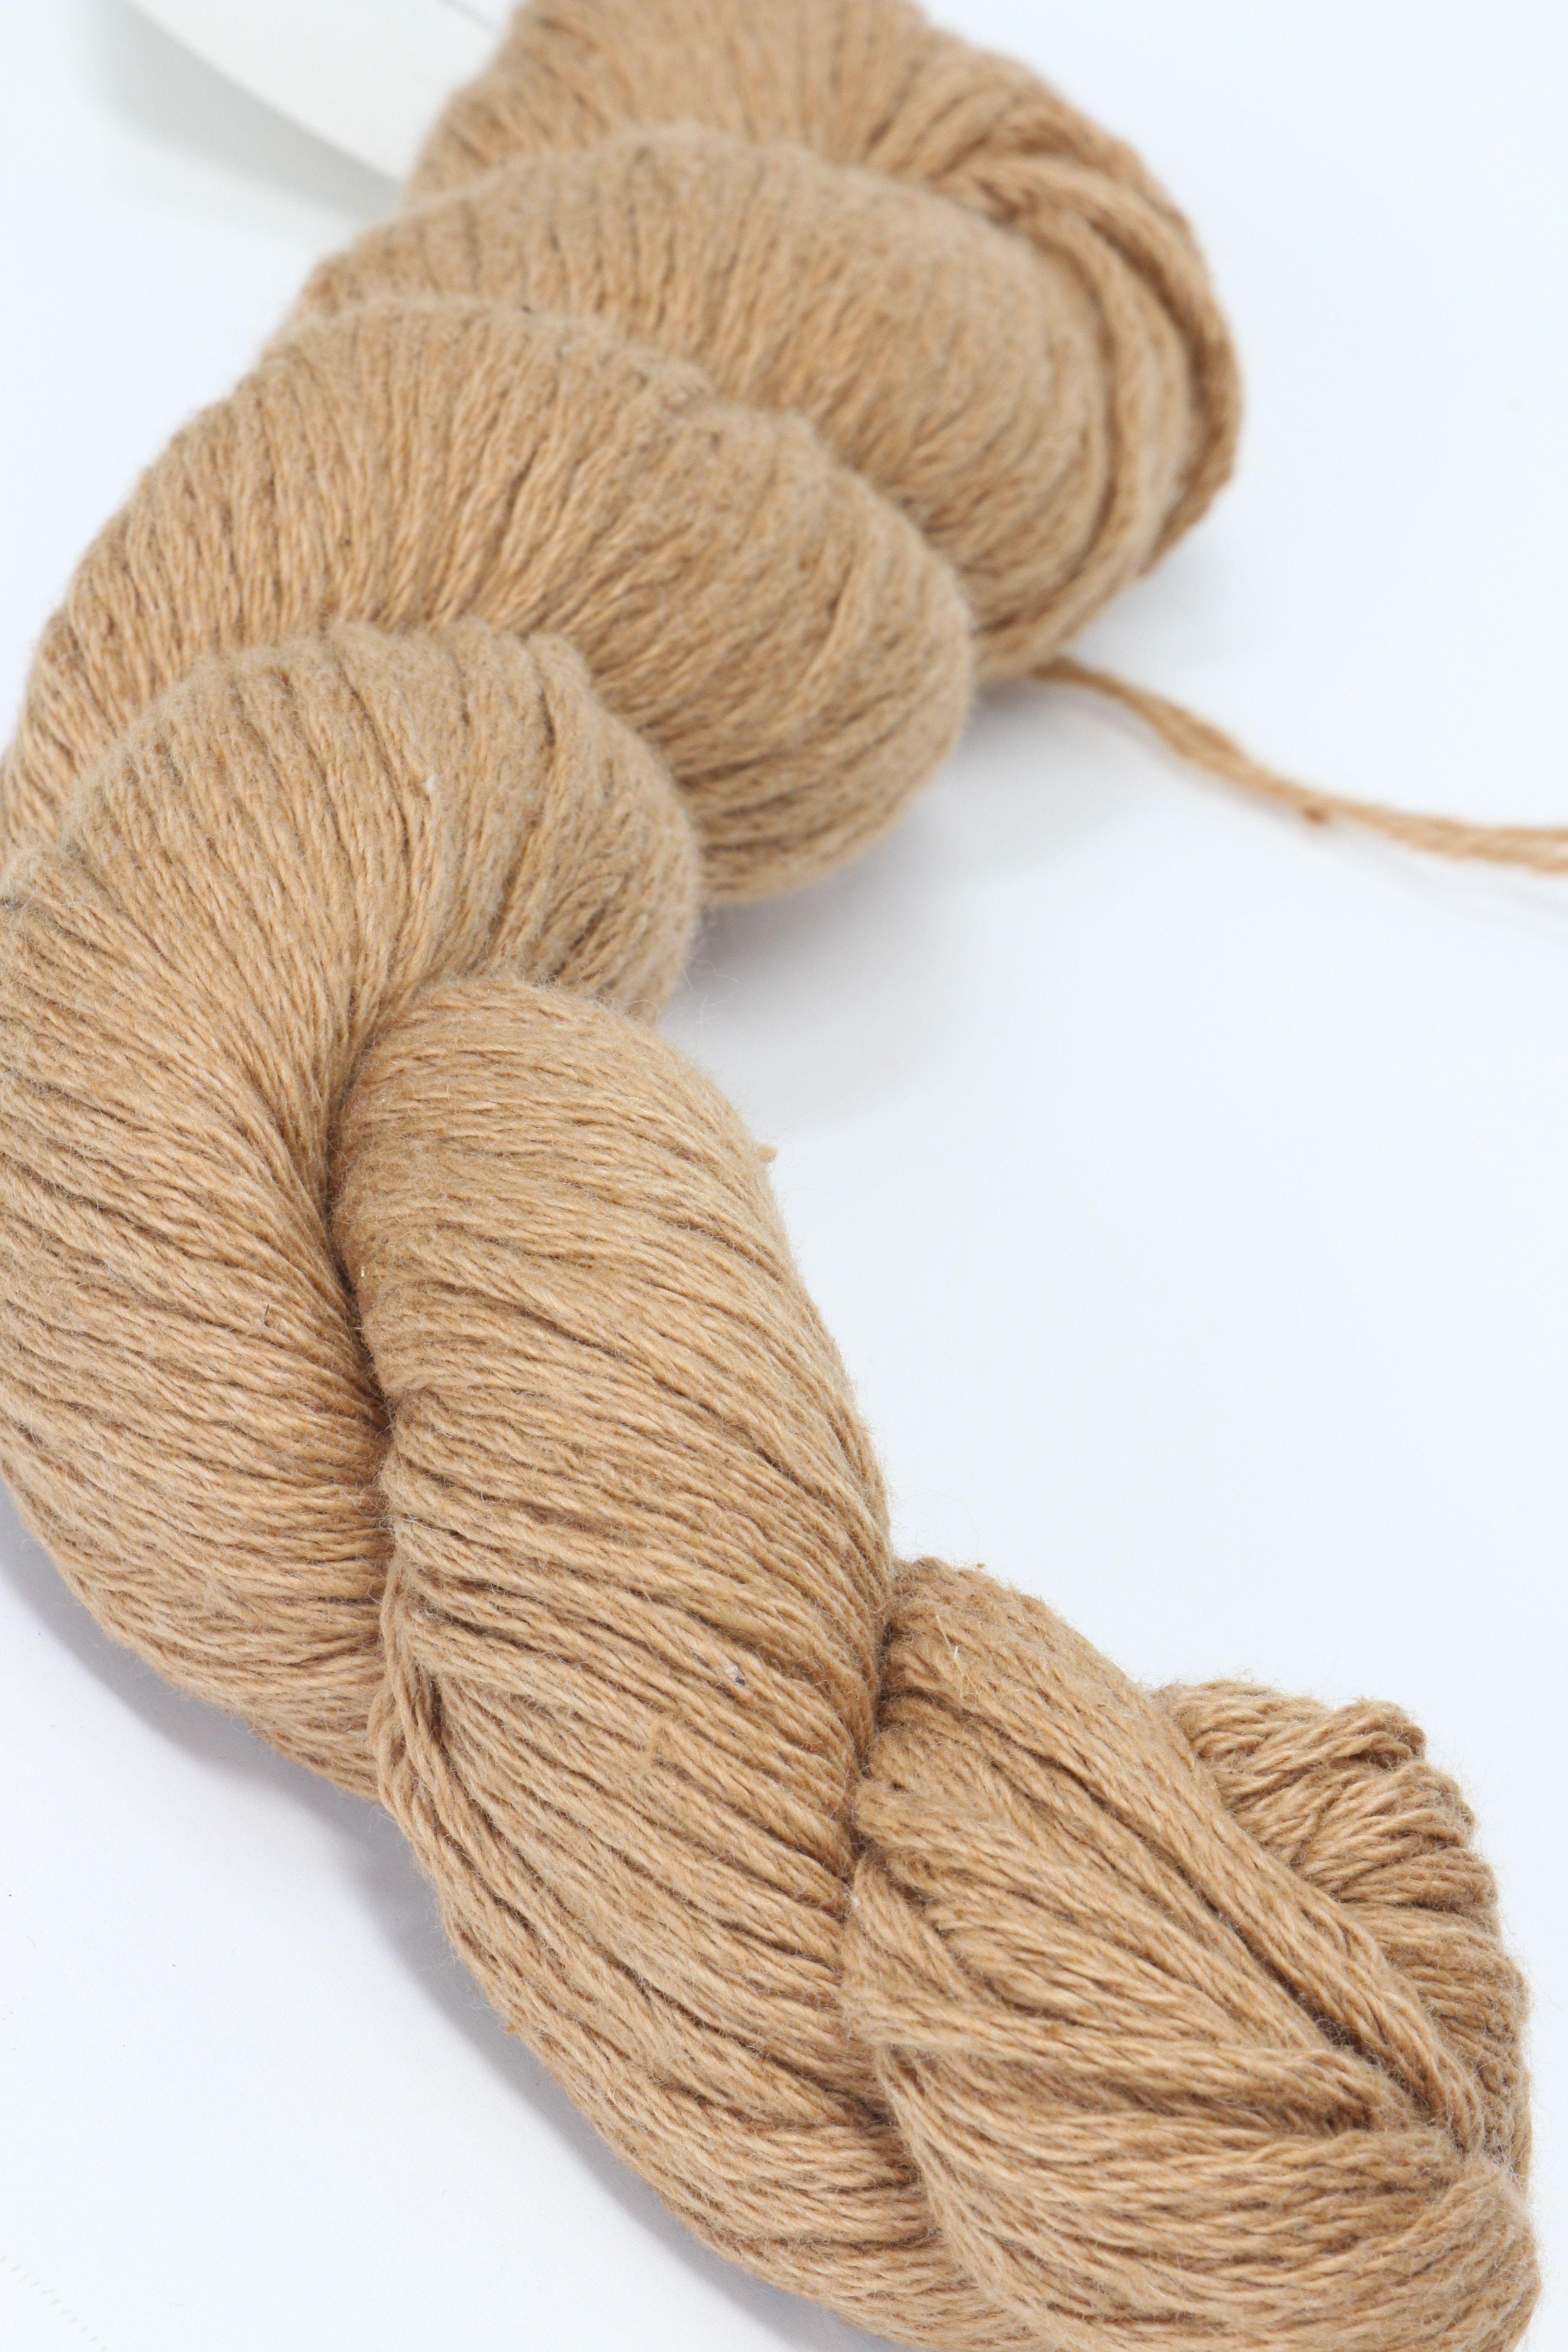 Worsted Weight Organic Cotton Yarn Blog Dandk